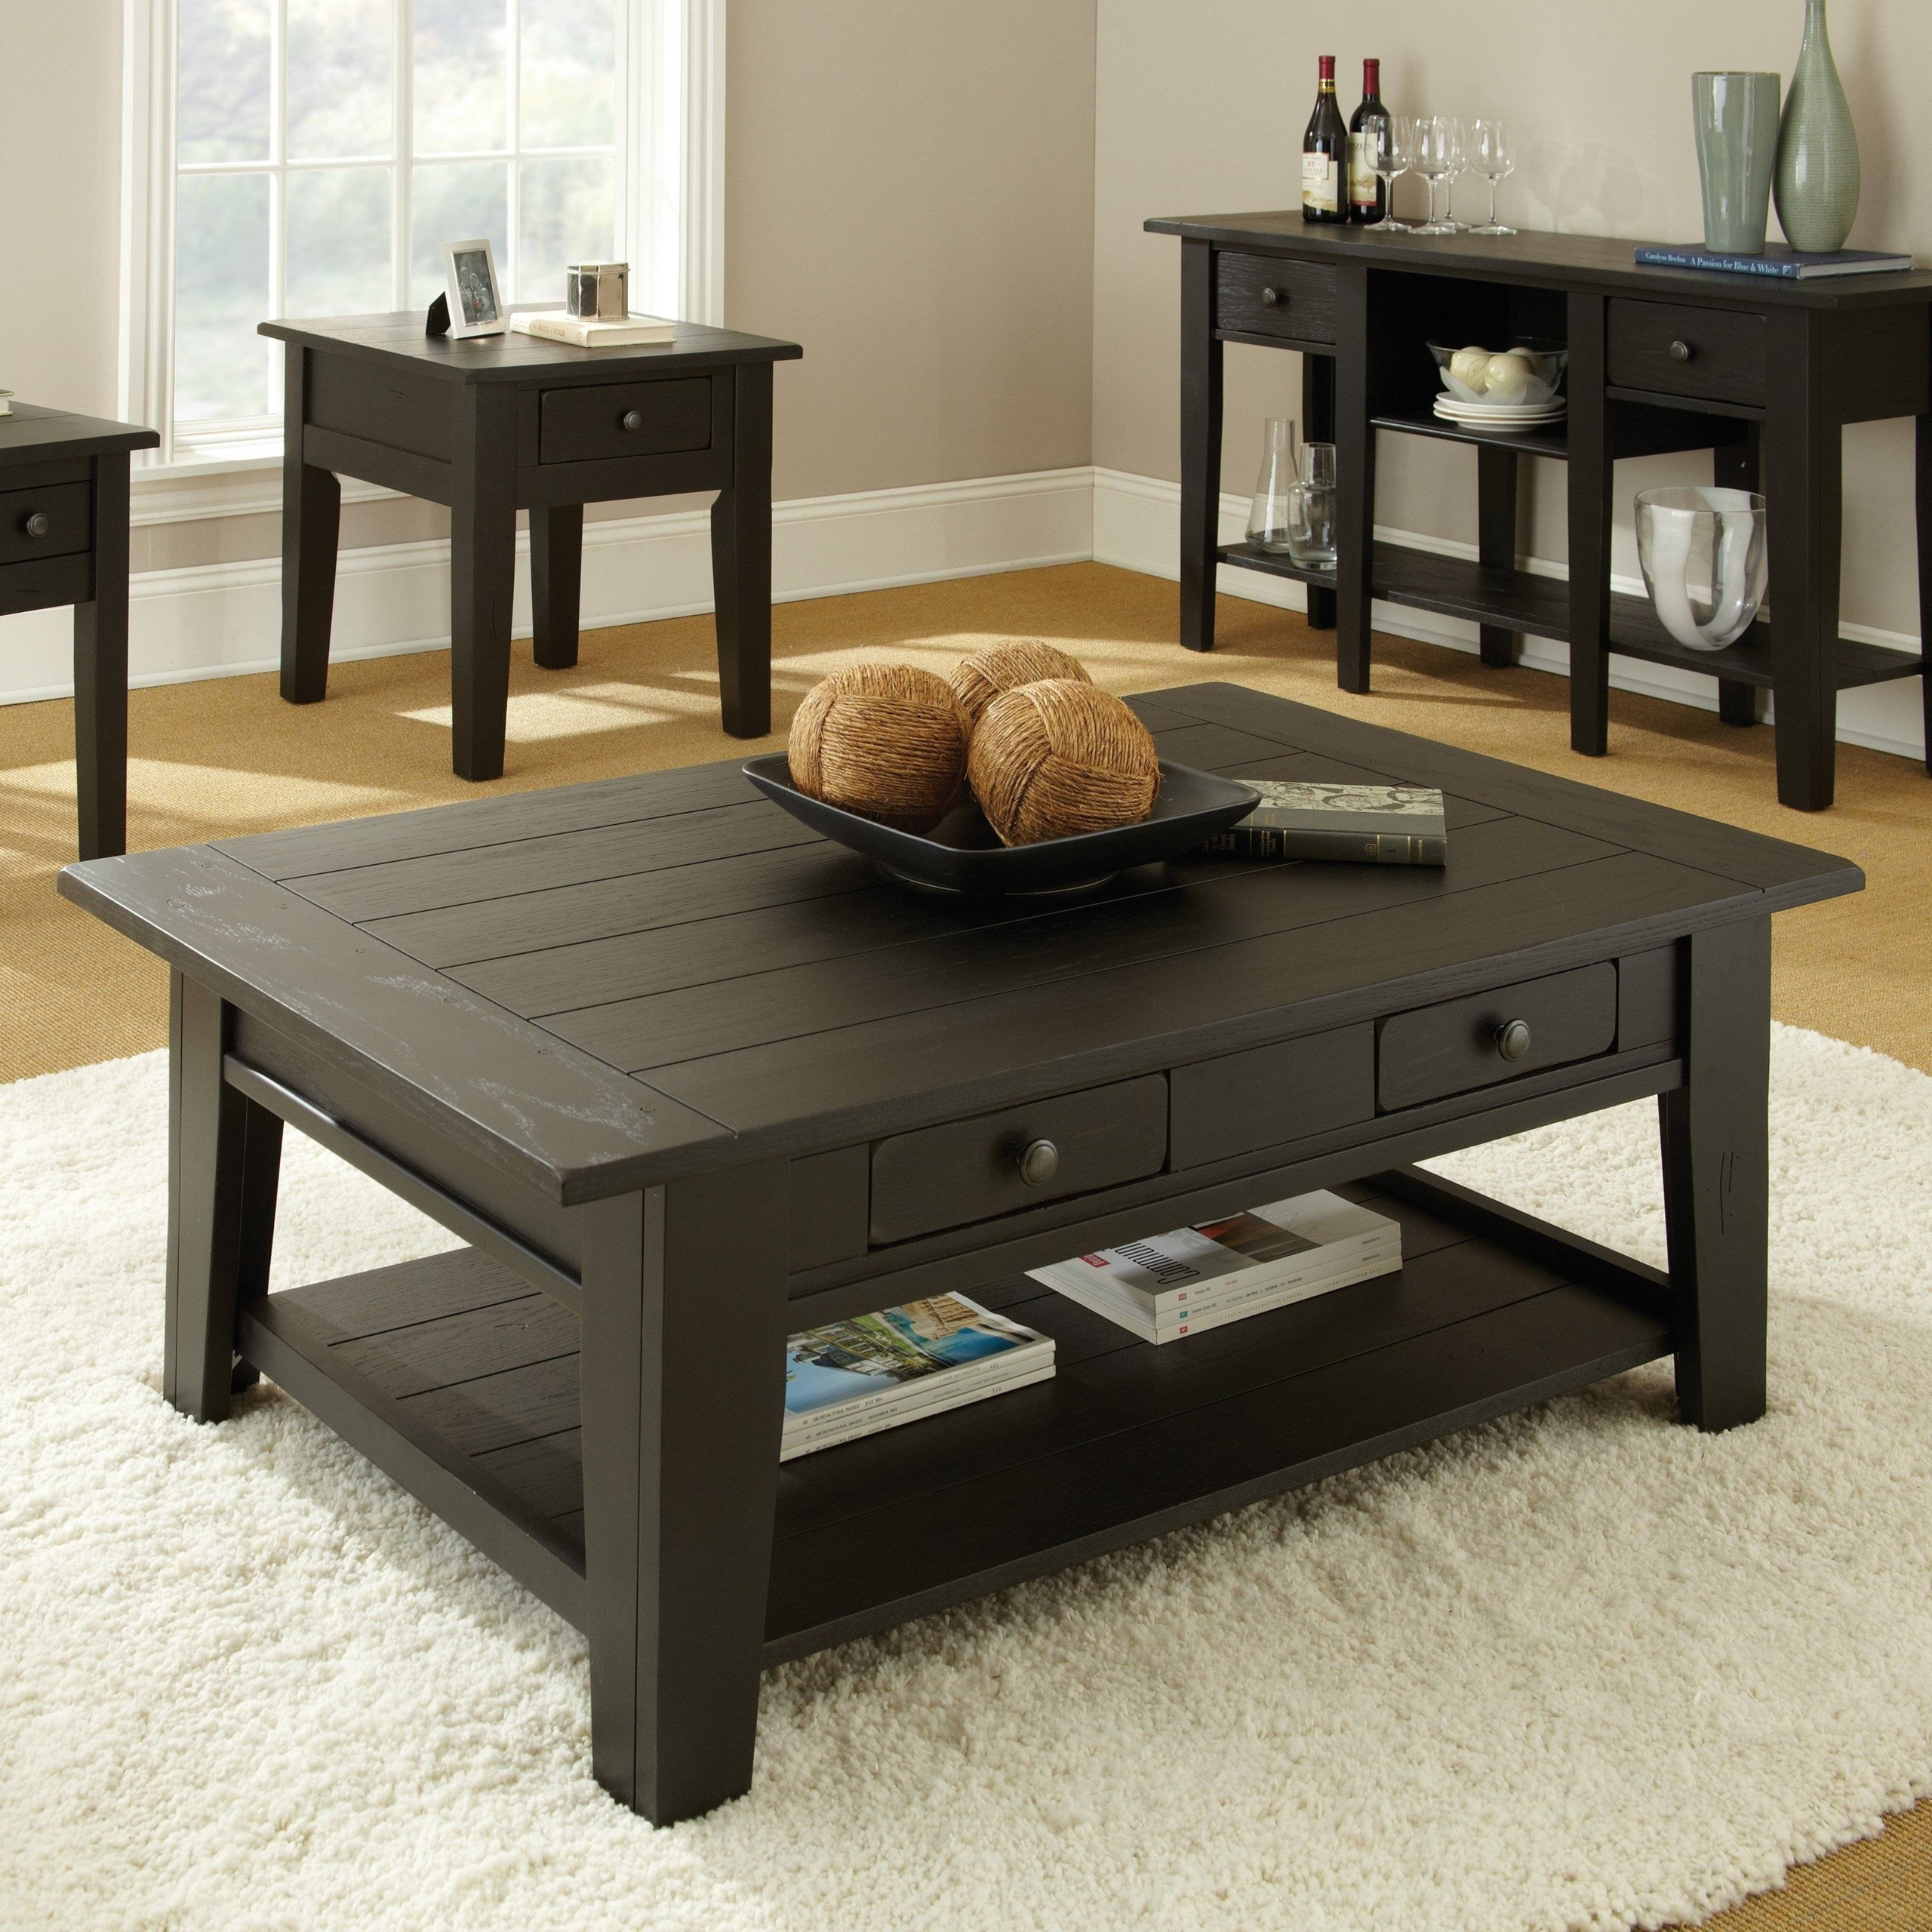 ad15238fb7100 Dark Wood Square Coffee Table - Ideas on Foter